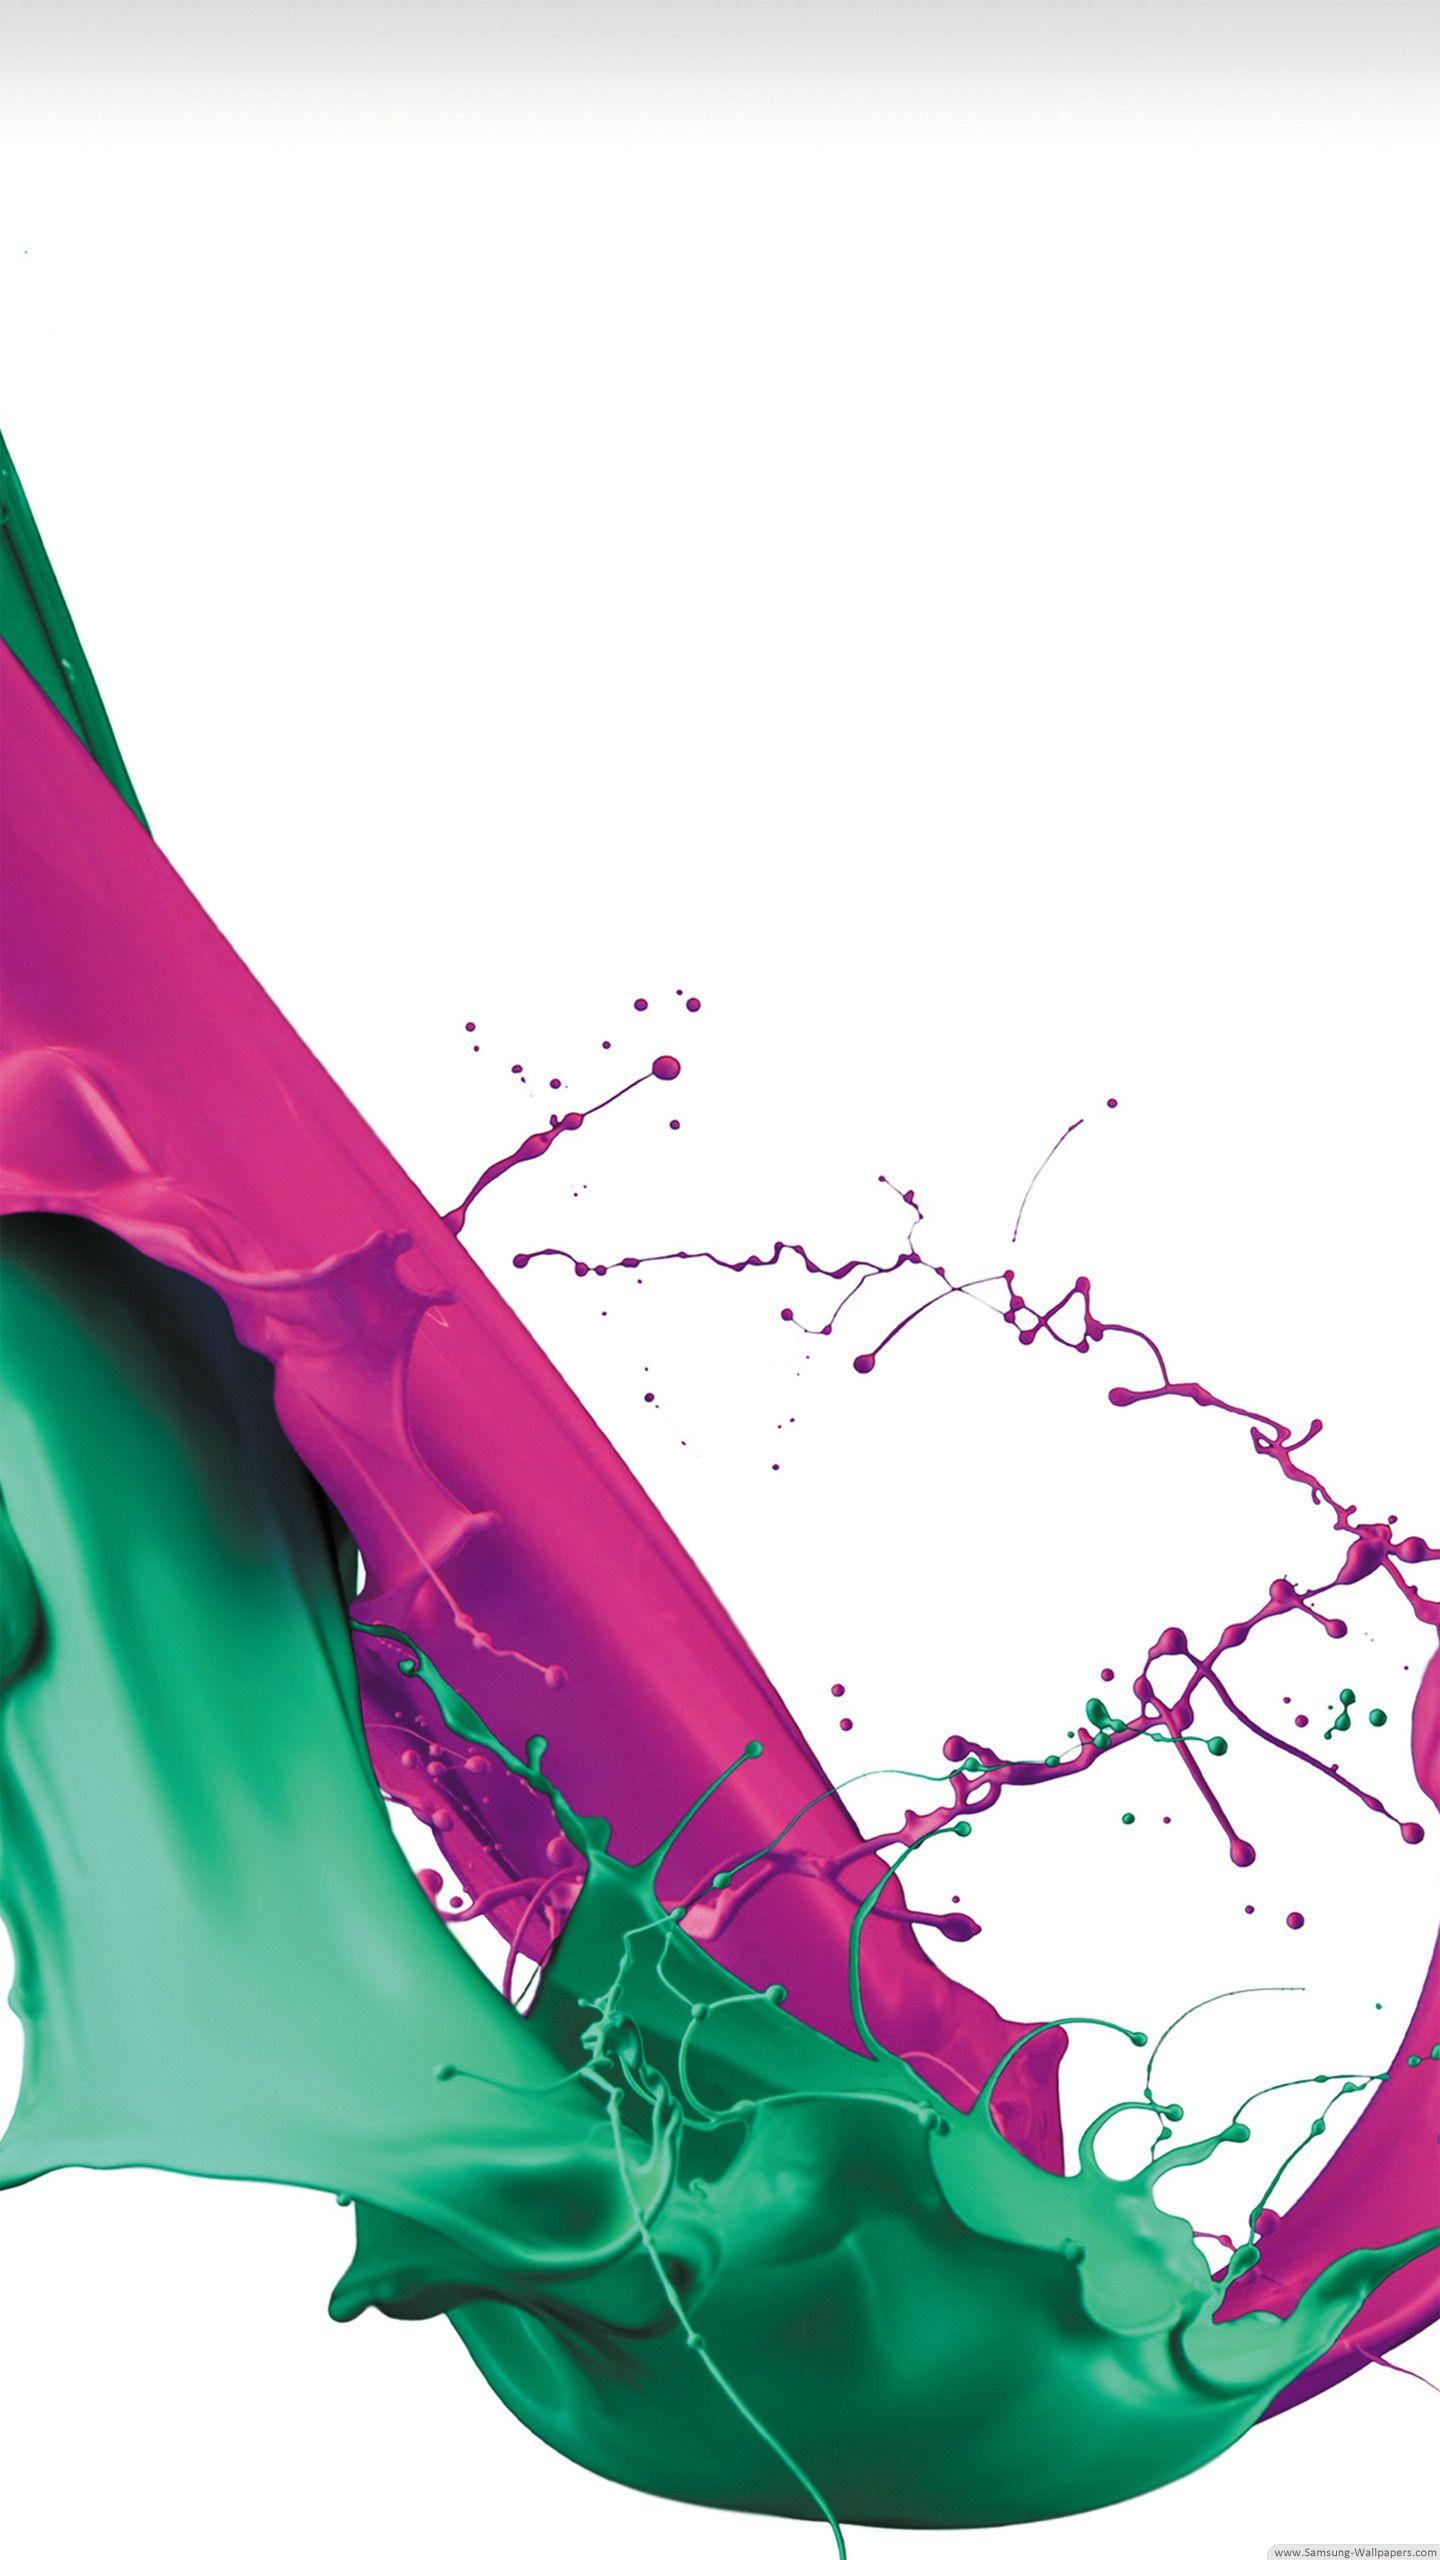 1440x2560 Lg G4 Official Stock Wallpaper 1440x2560 For Samsung Galaxy S6 Hd Paint Splash Background Painting Wallpaper Paint Splash